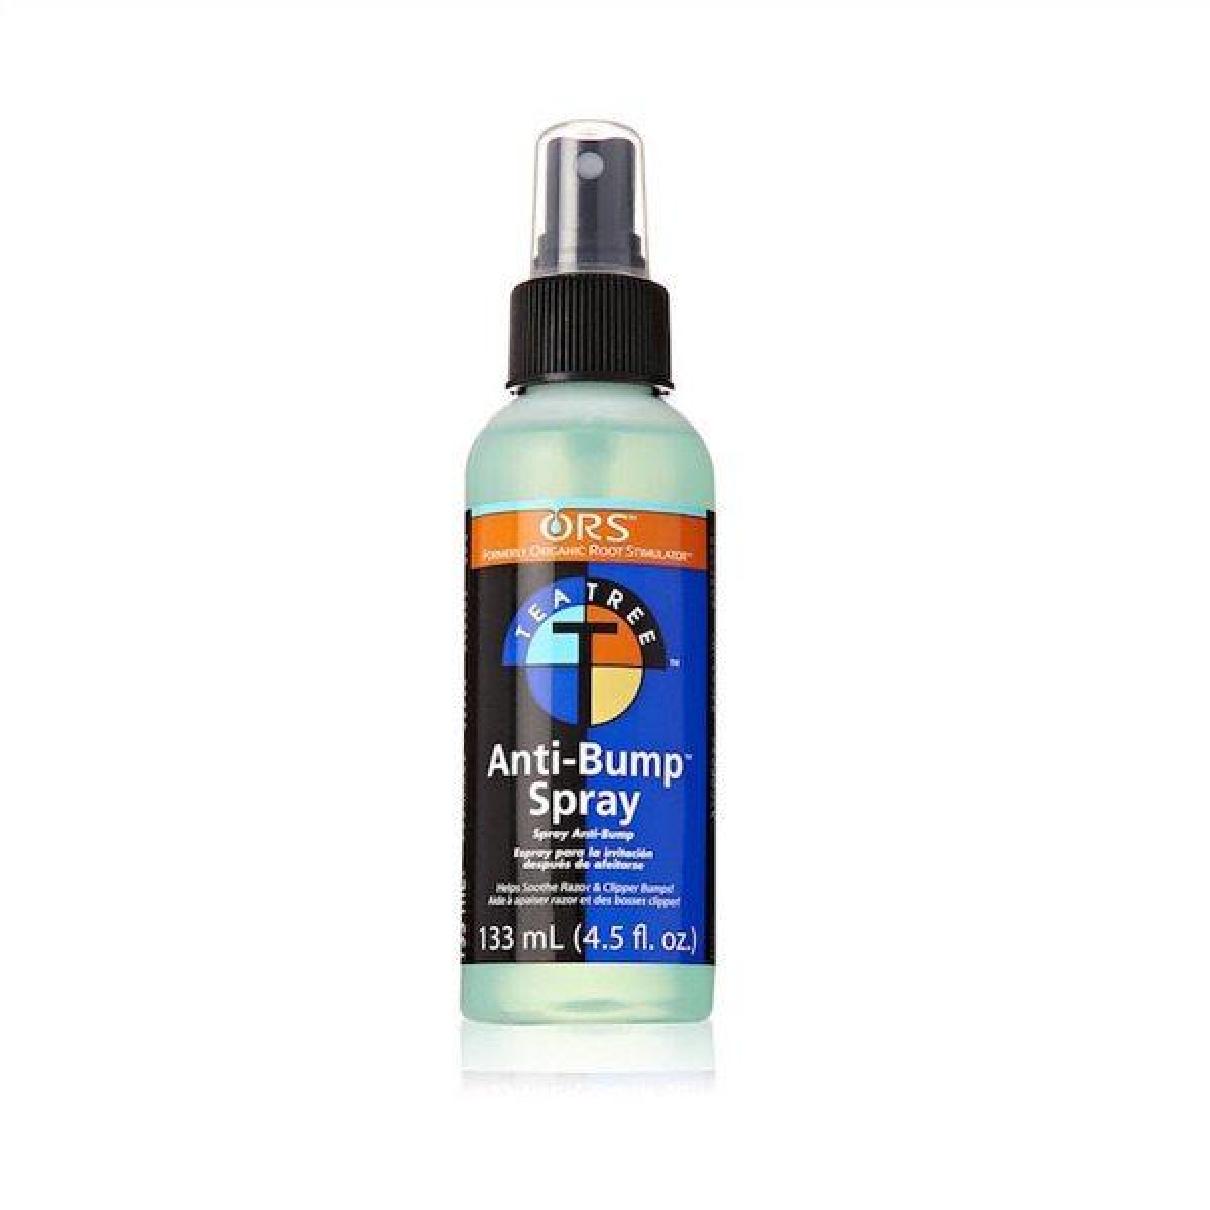 ORS-Tea-Tree-Oil-Anti-Bump-Spray-4.5oz